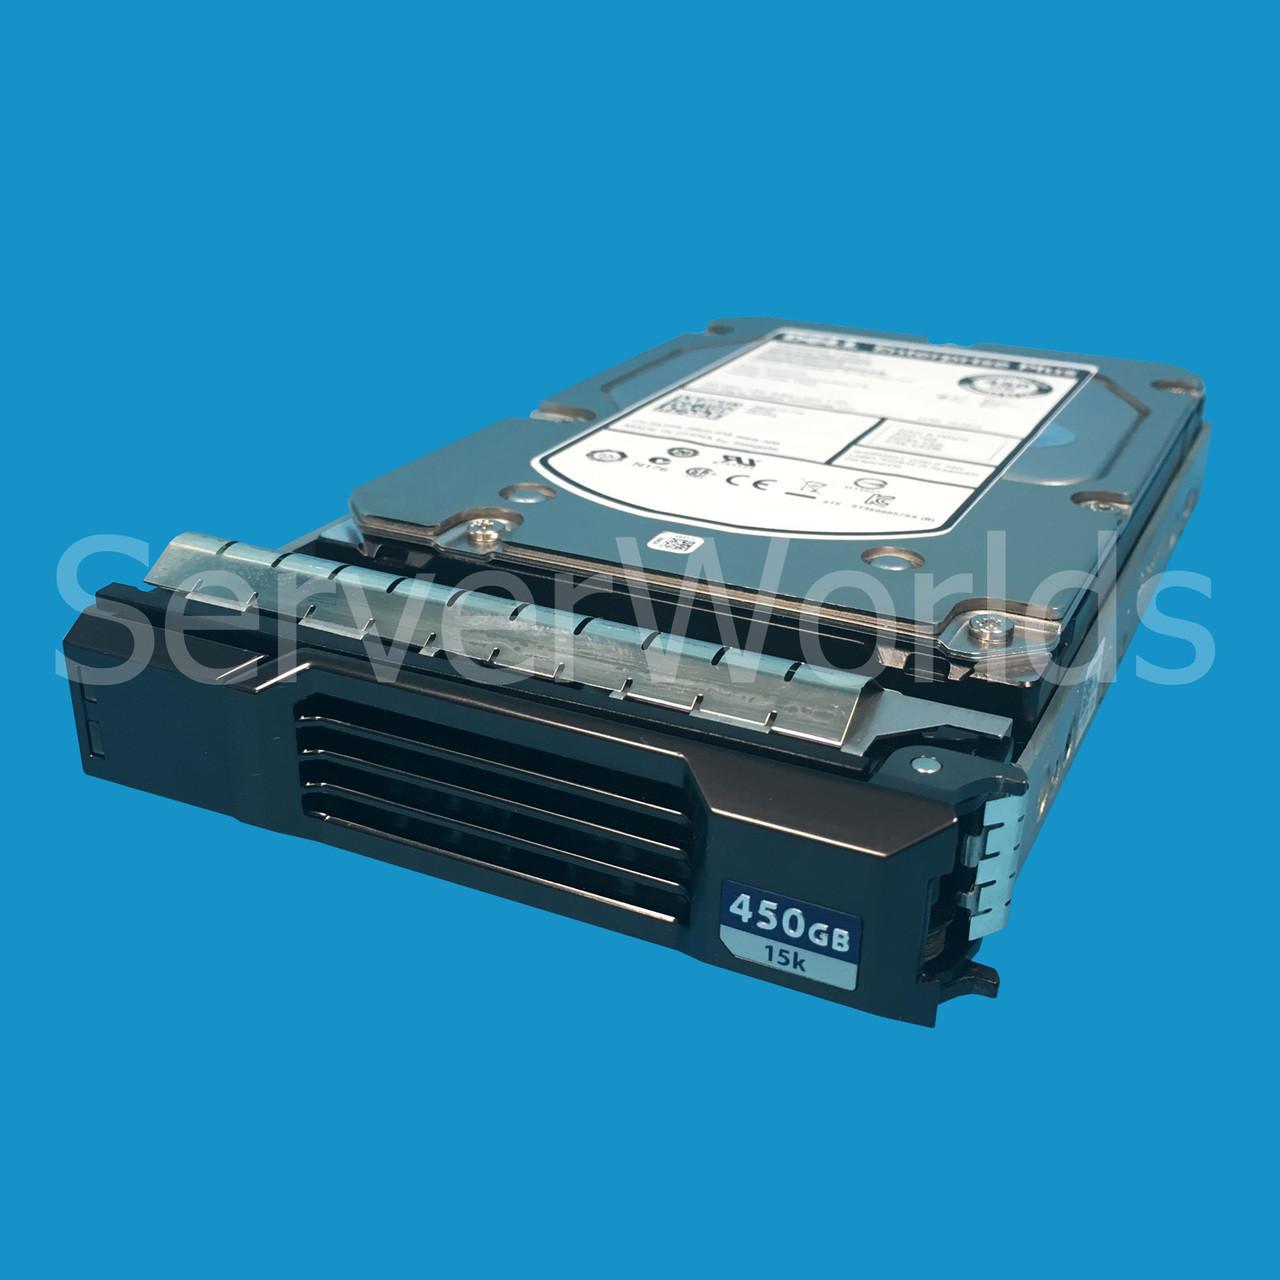 Dell 3J3K9 | Compellent ST3450857SS | 9FM066-058 - Serverworlds